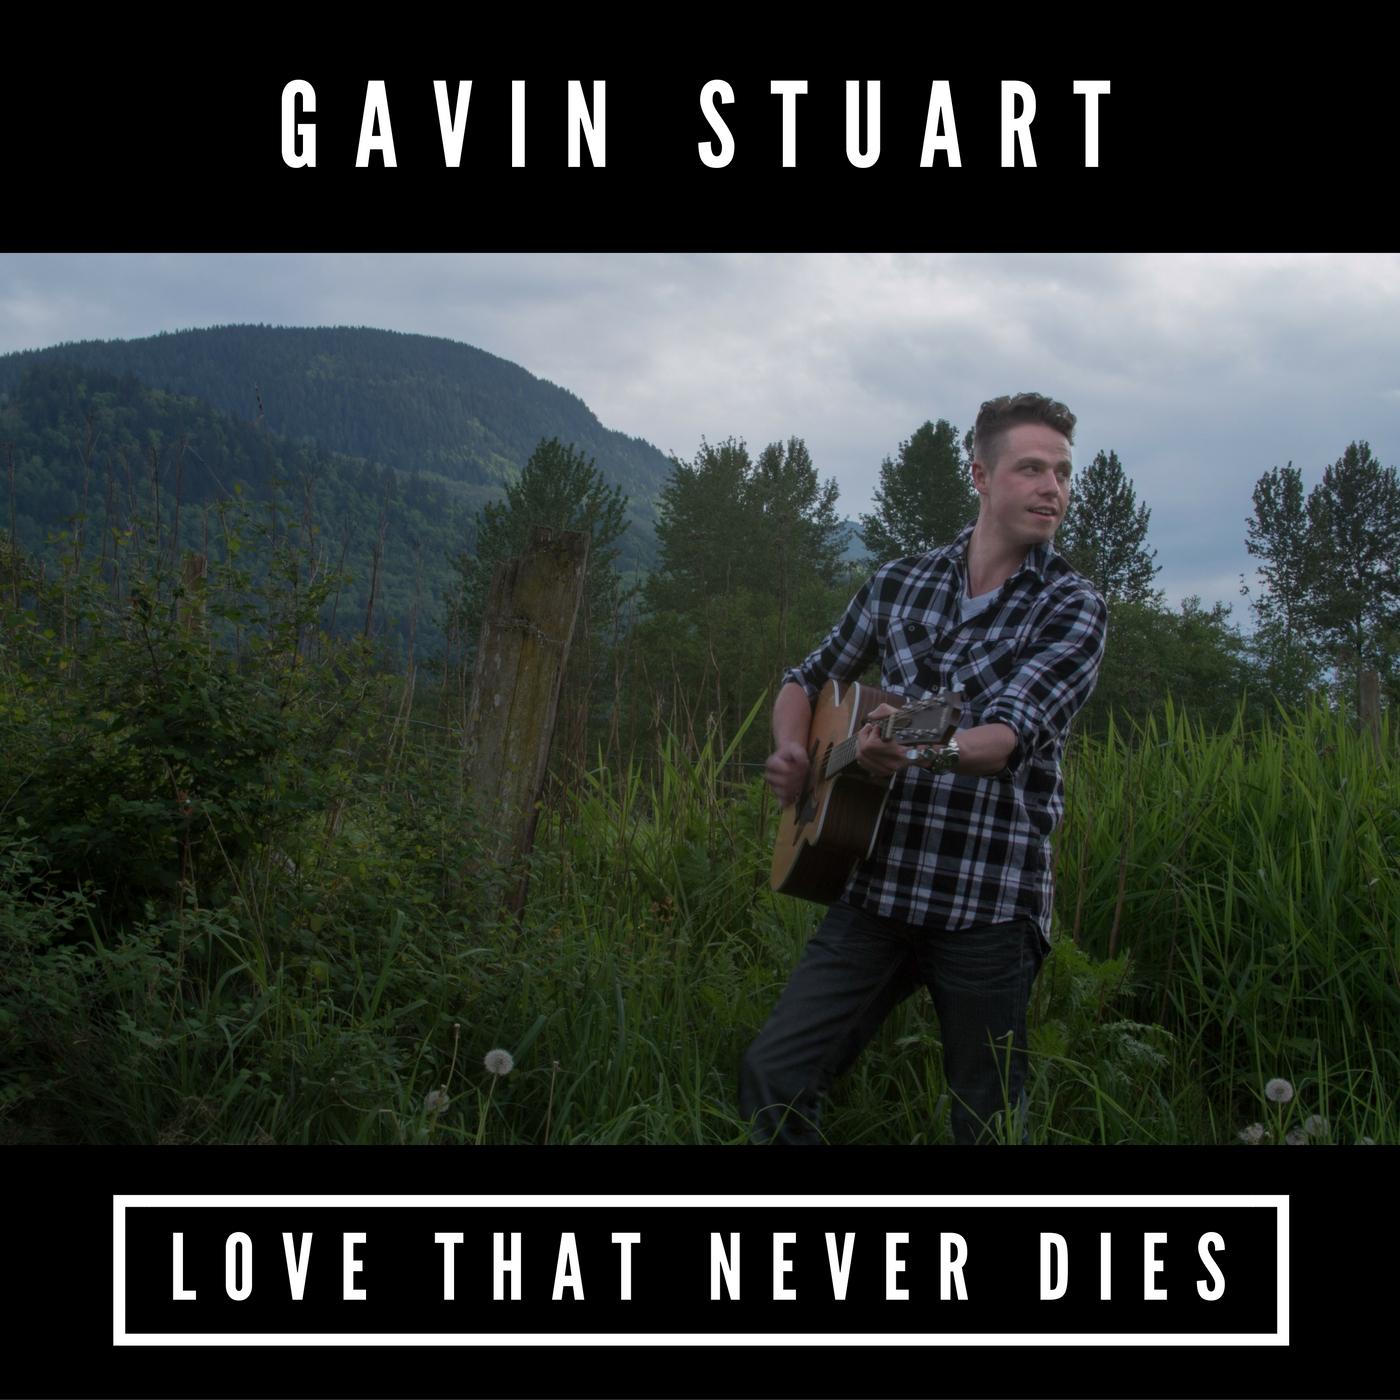 Love That Never Dies Cover.jpg